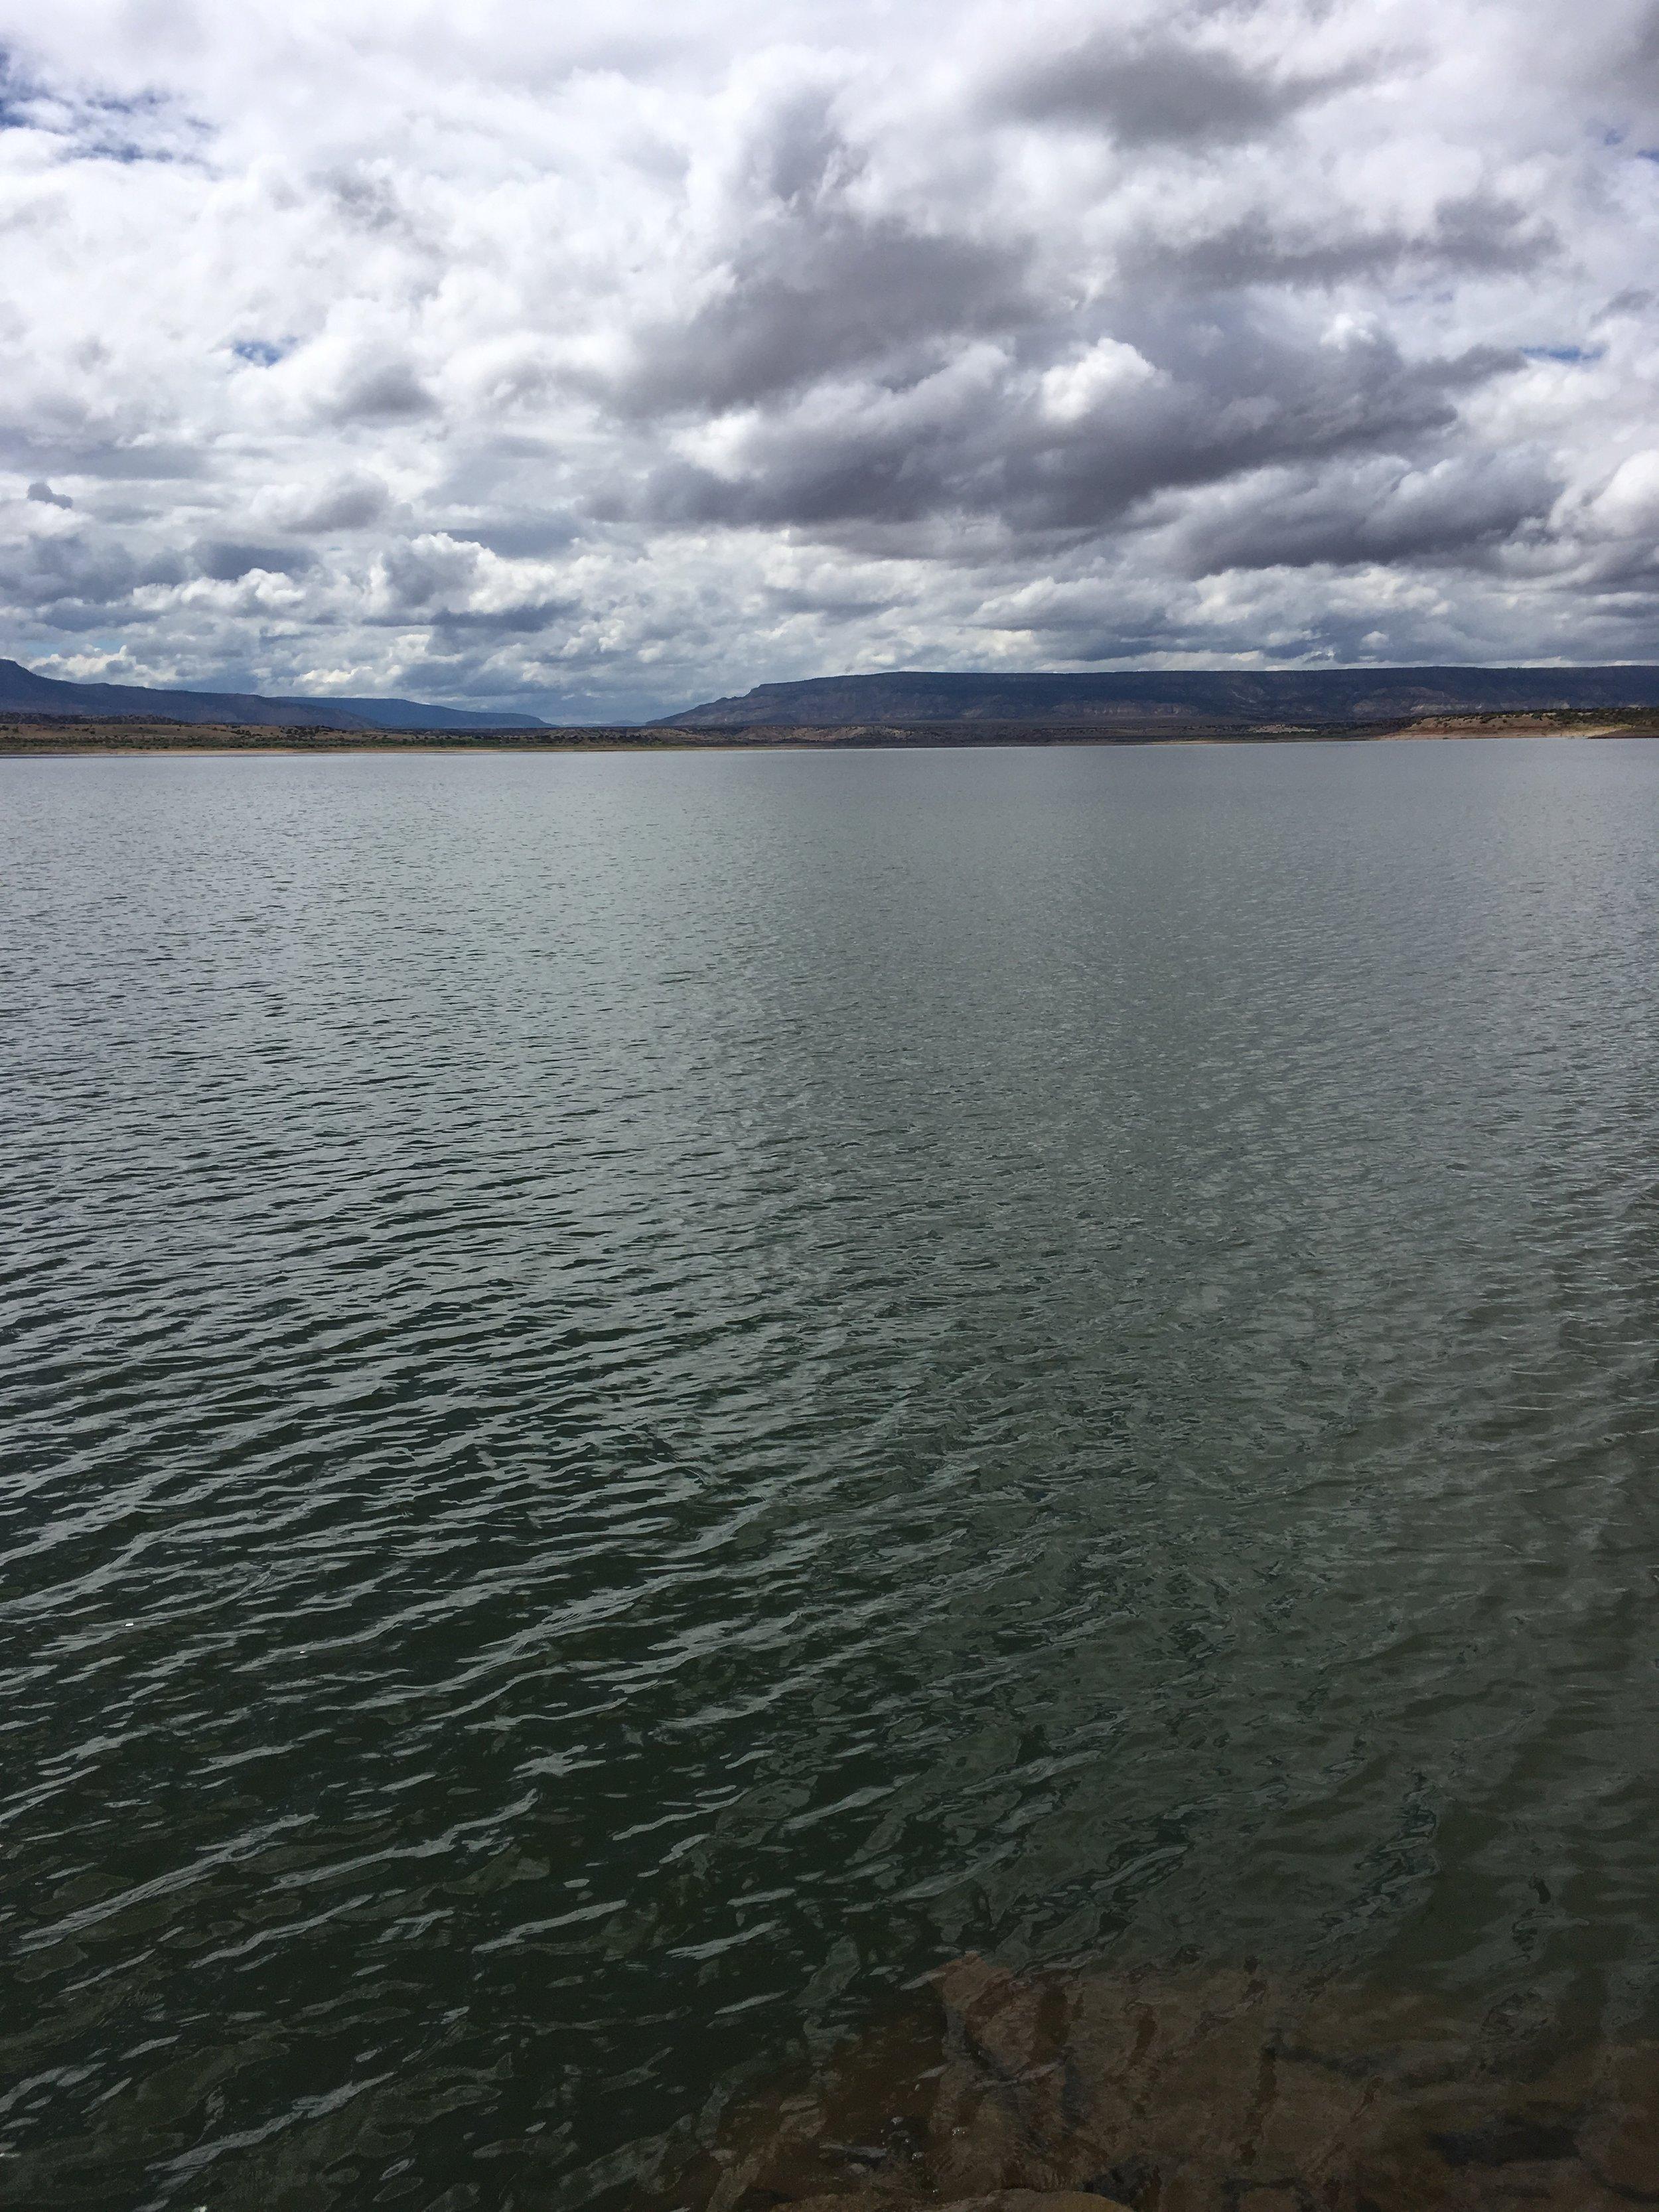 Clouds at the lake